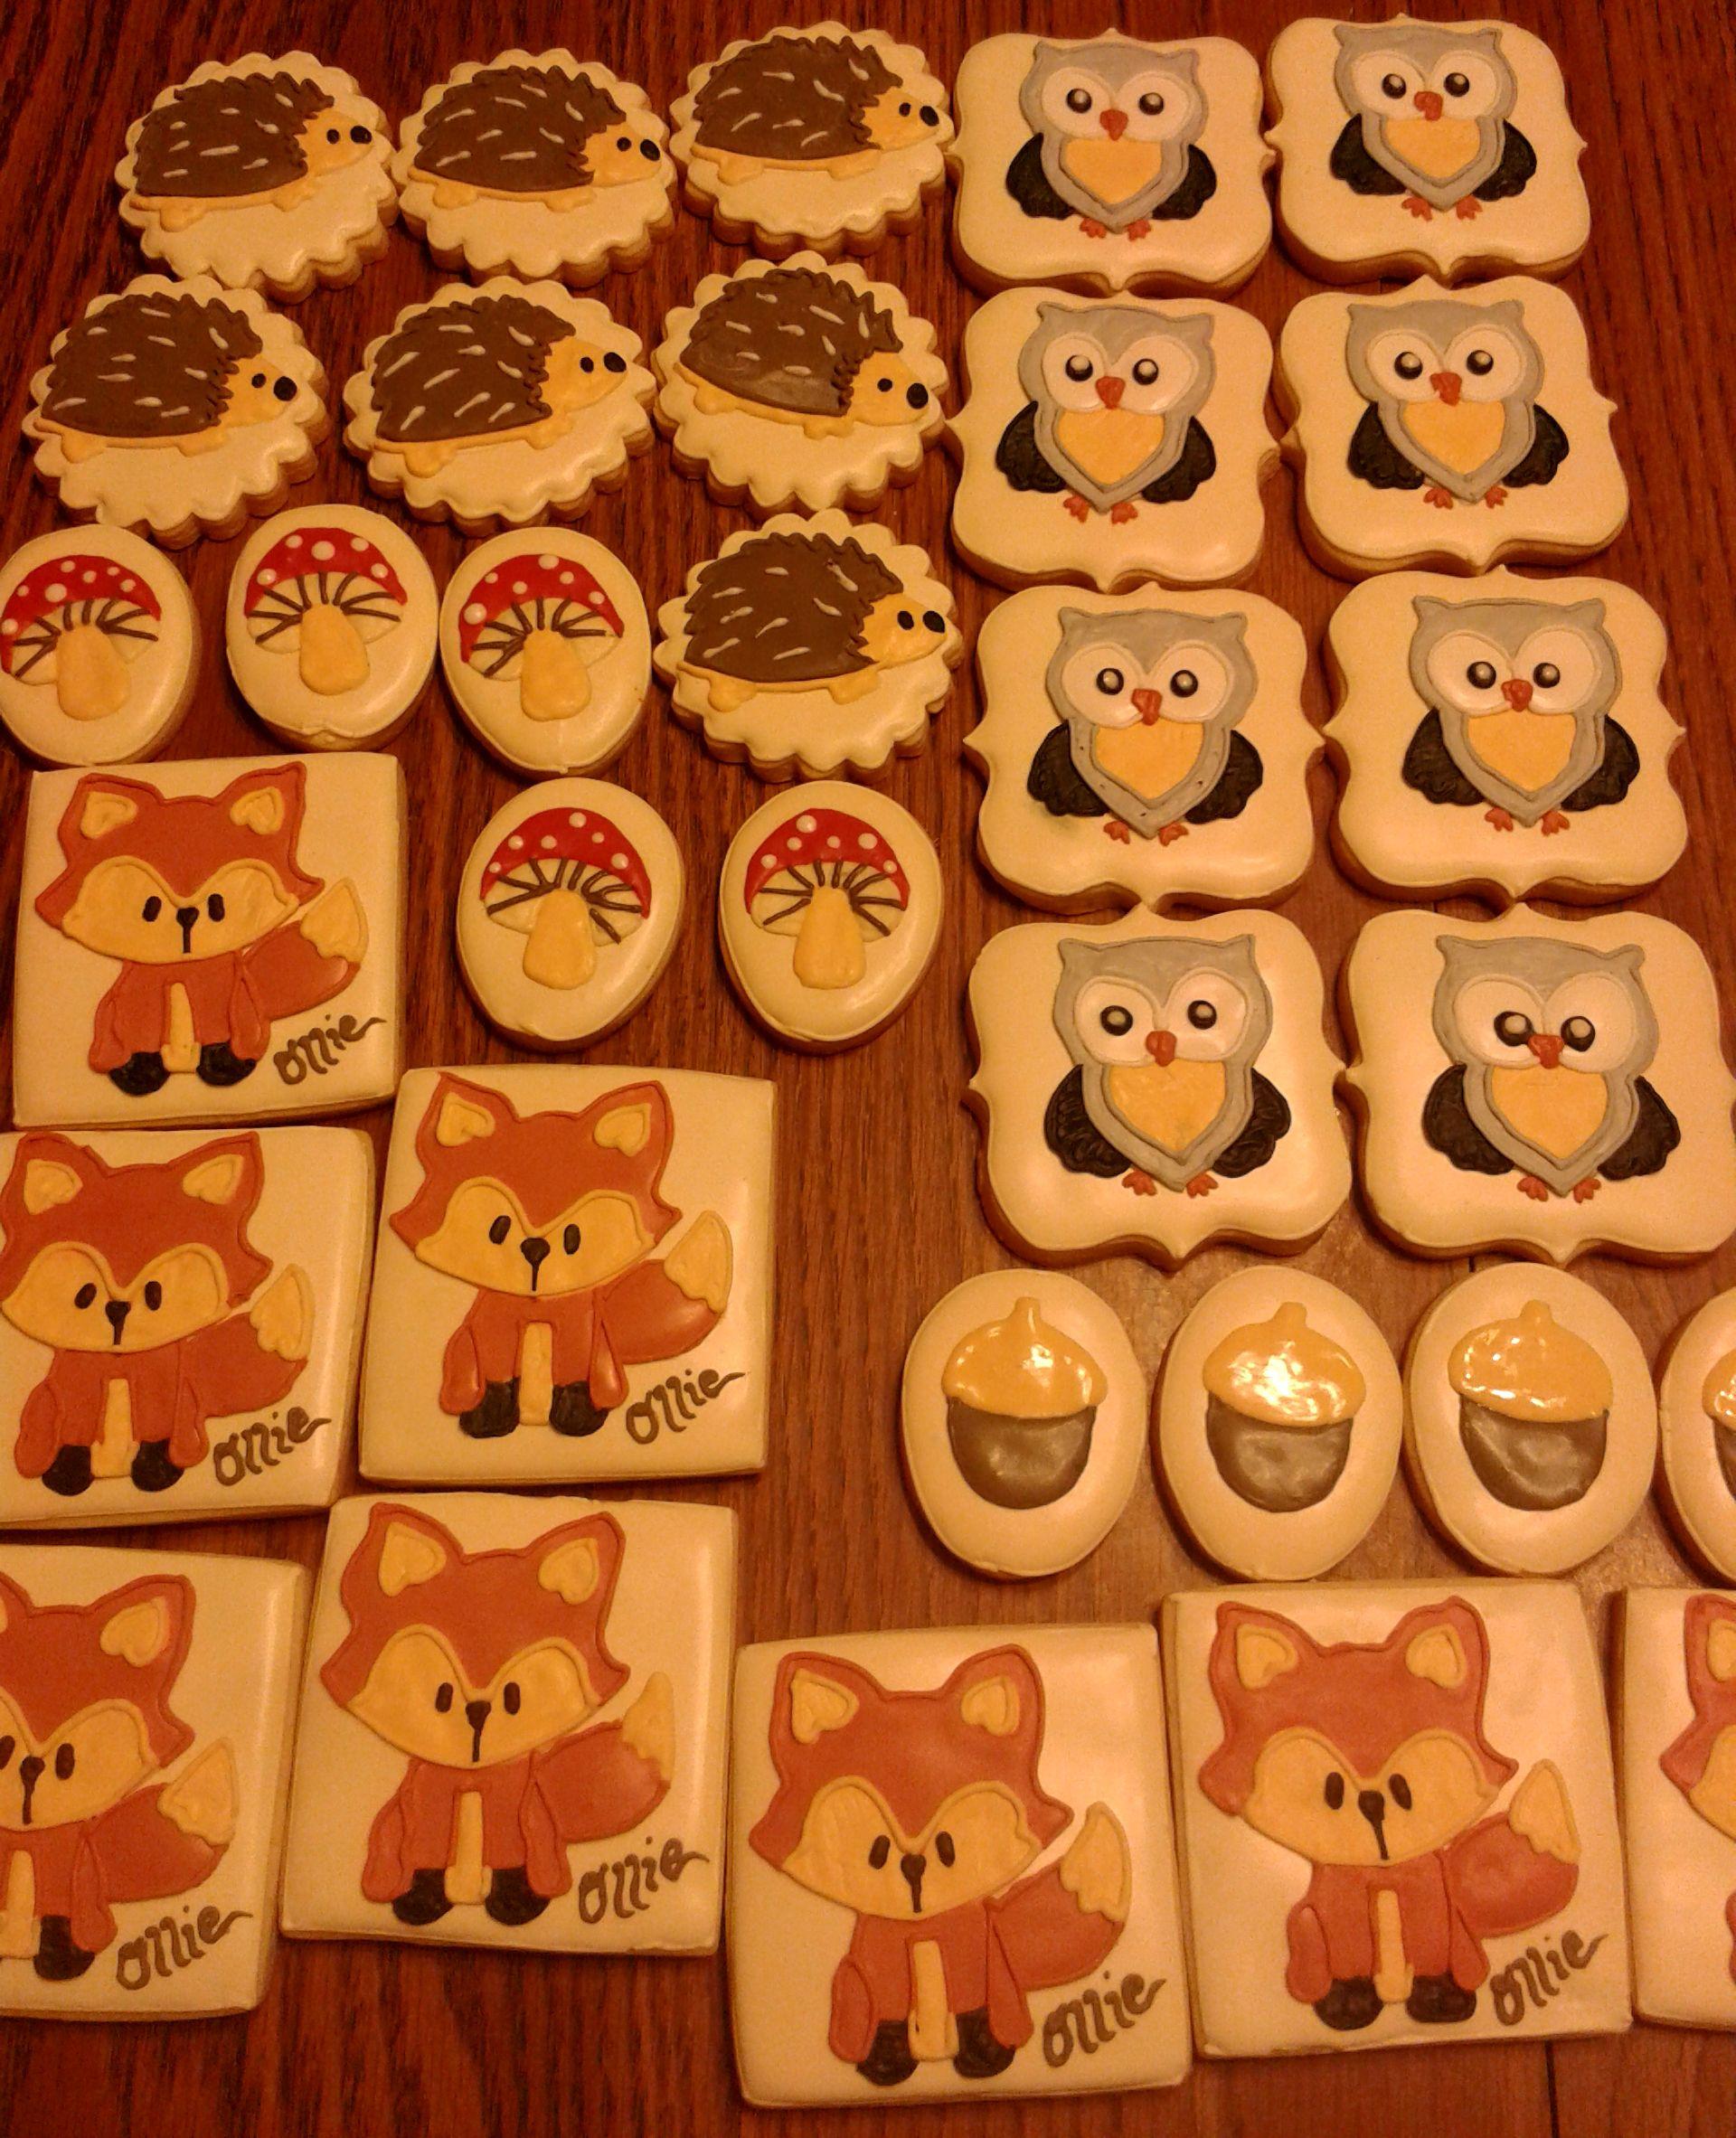 Woodland Animal/Creature Cookies. Foxes, owls, hedgehogs, mushrooms, and acorns.